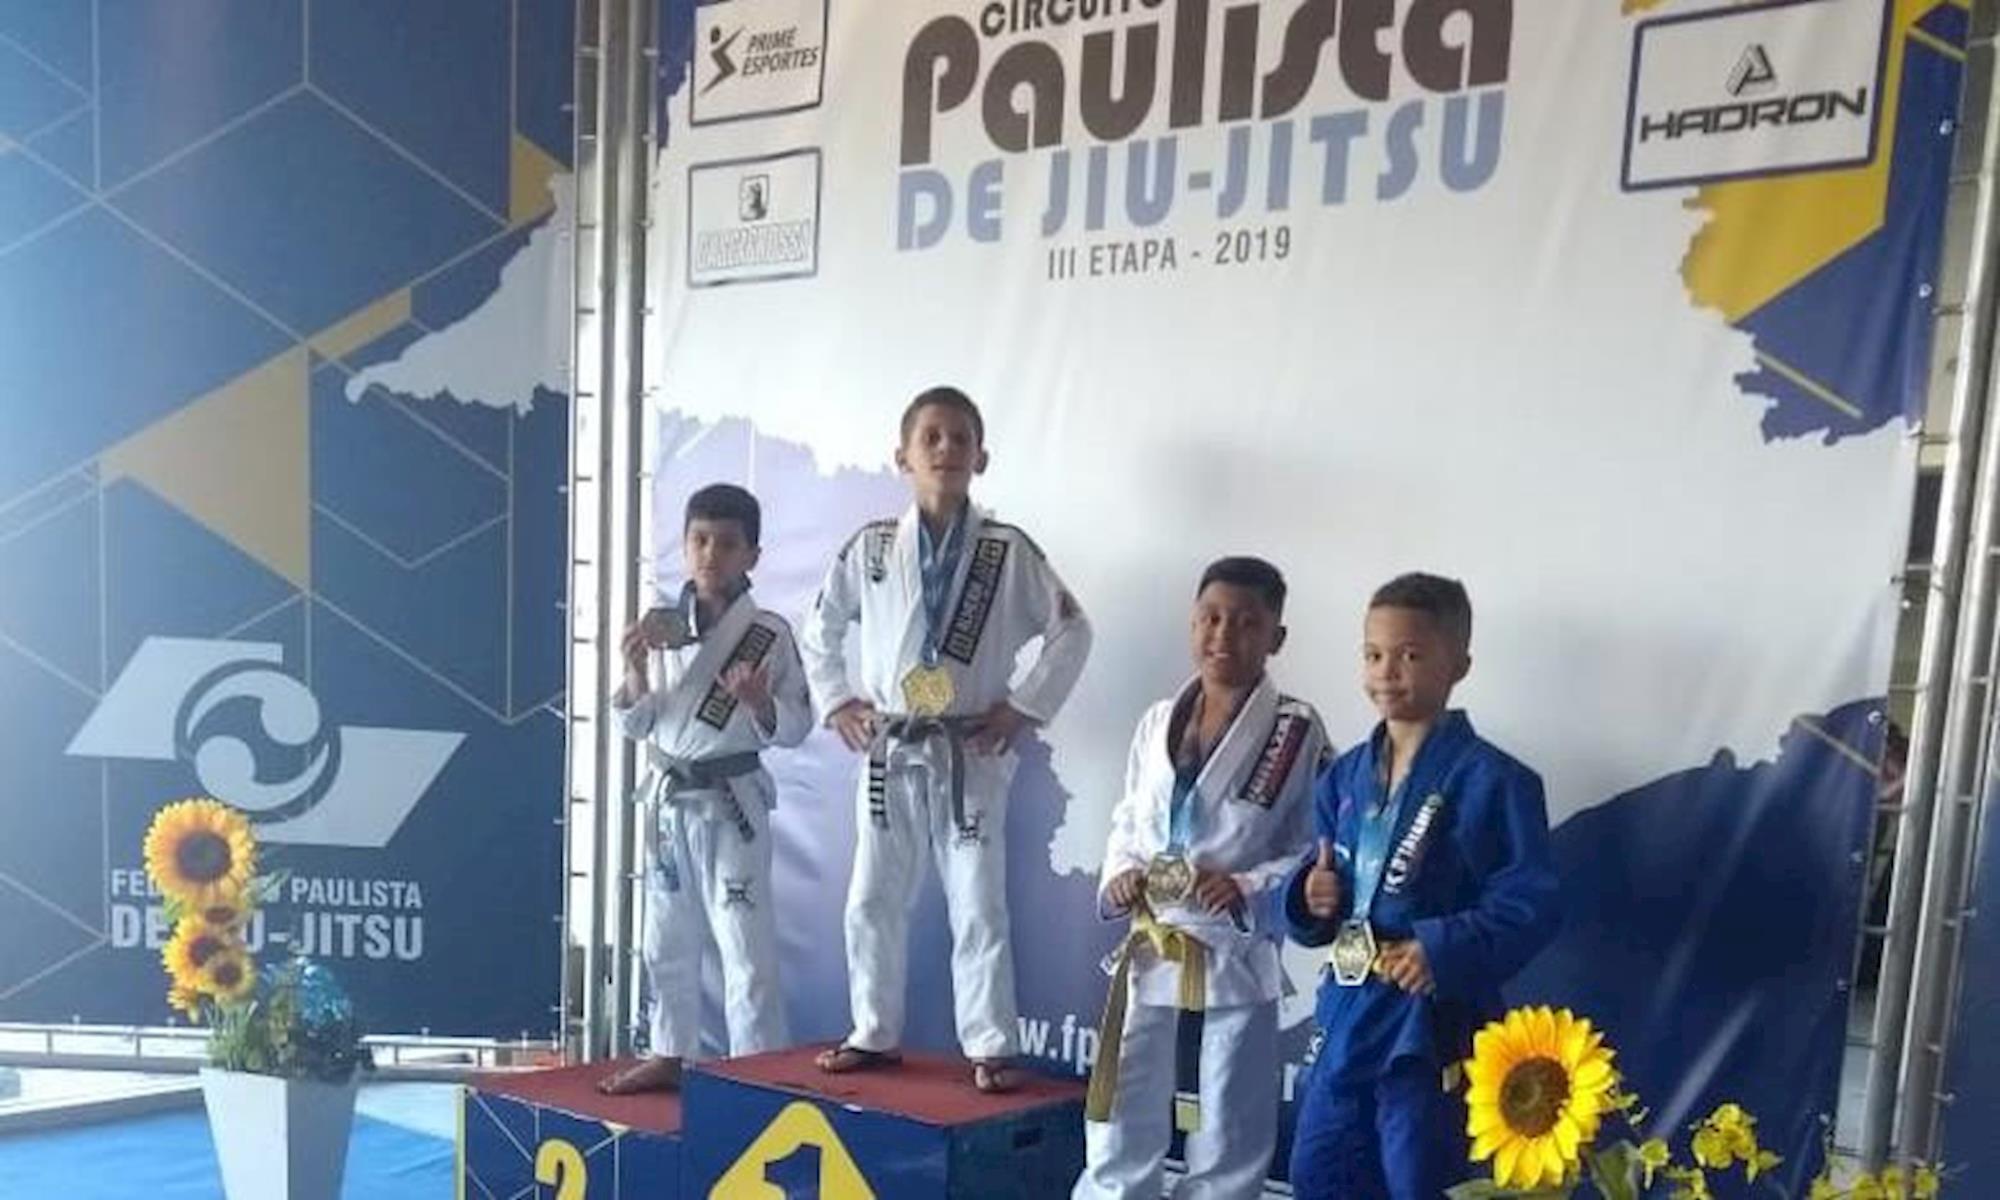 Dana Jiu Jitsu, Divulgação